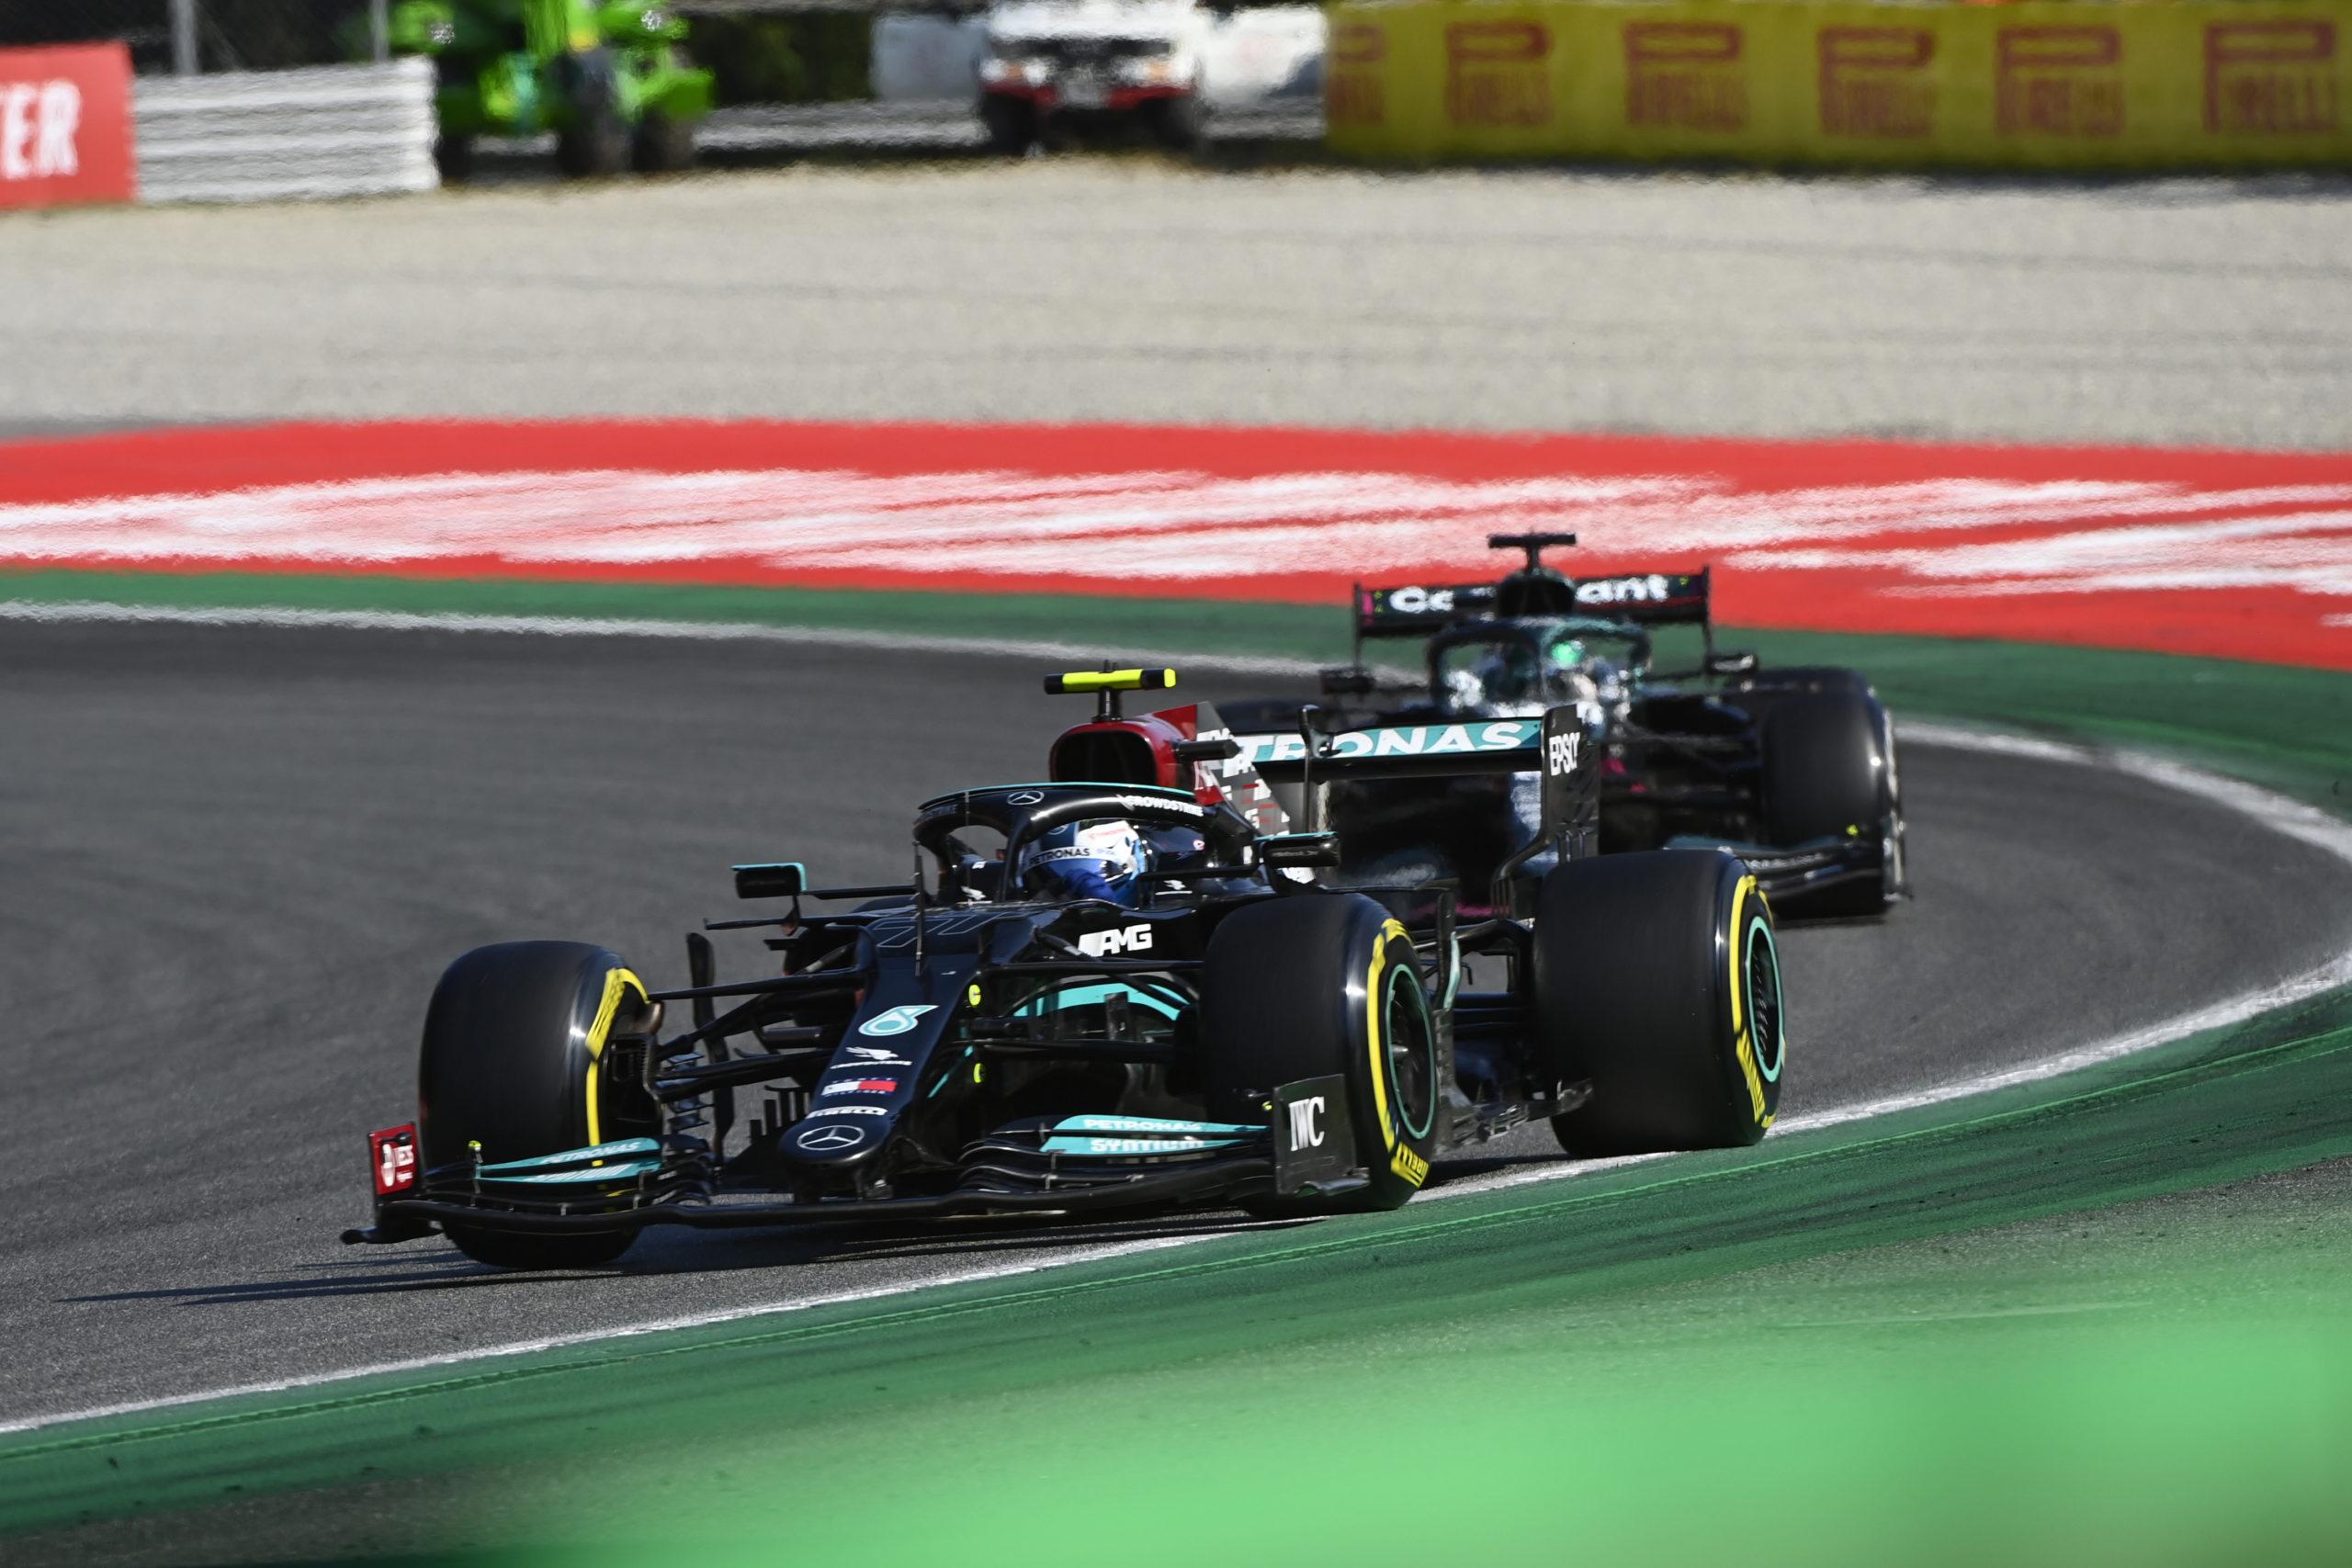 Valtteri Bottas, Mercedes, 2021 Italian Grand Prix, Sunday - LAT Images